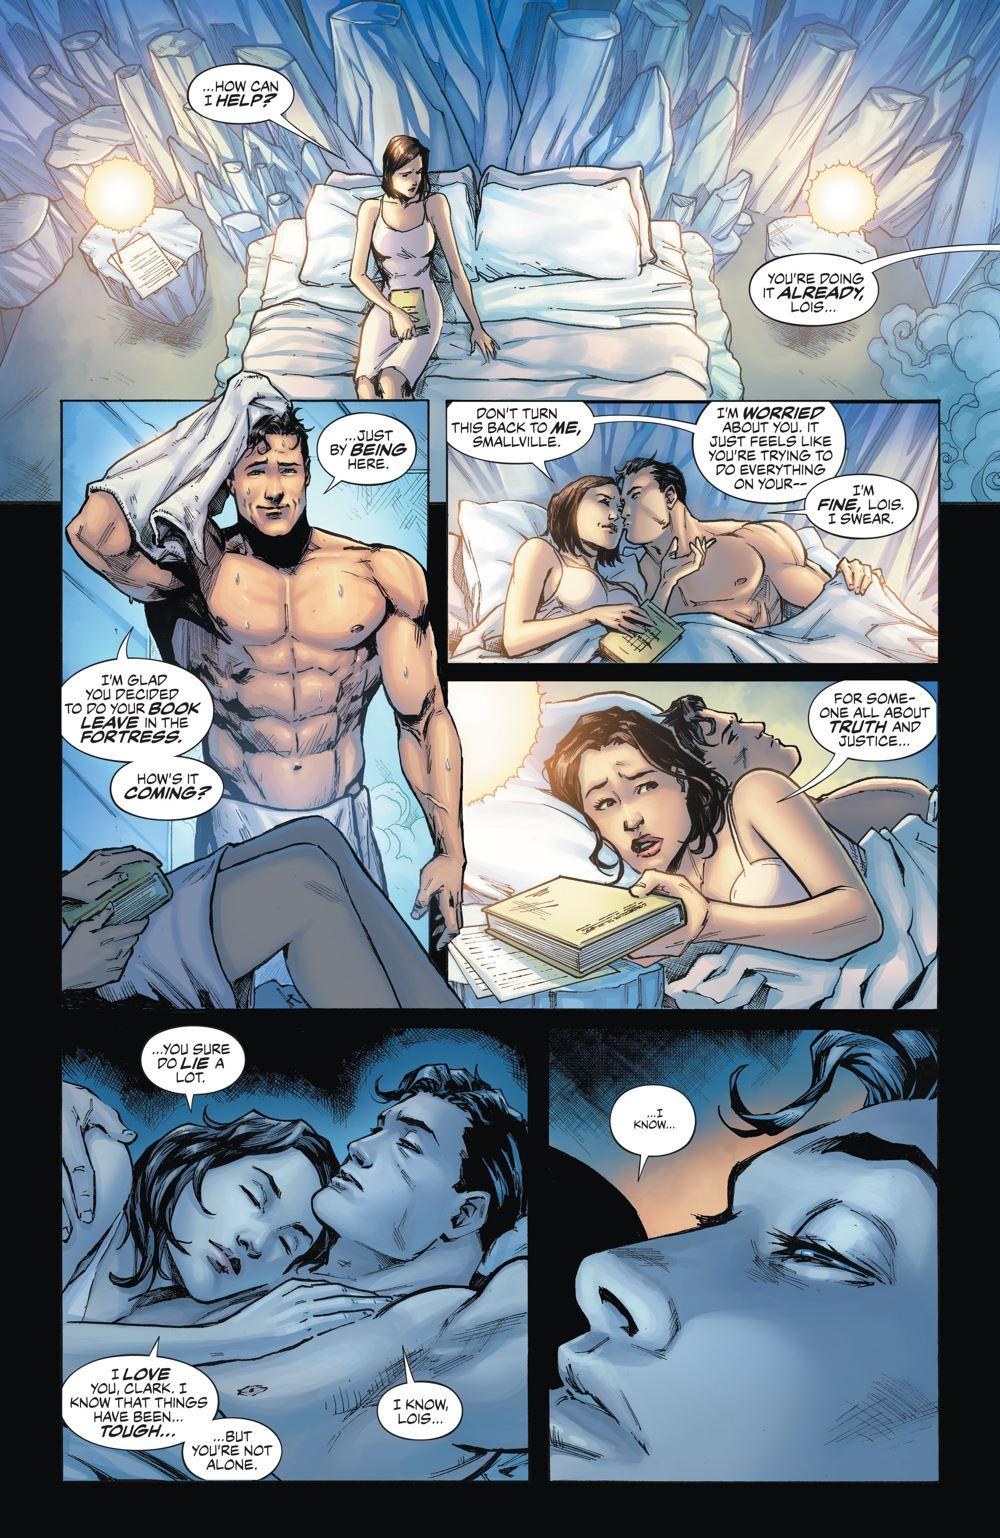 Justice-League-Last-Ride-1-5_60935c82c9cc32.80116364 ComicList Previews: JUSTICE LEAGUE LAST RIDE #1